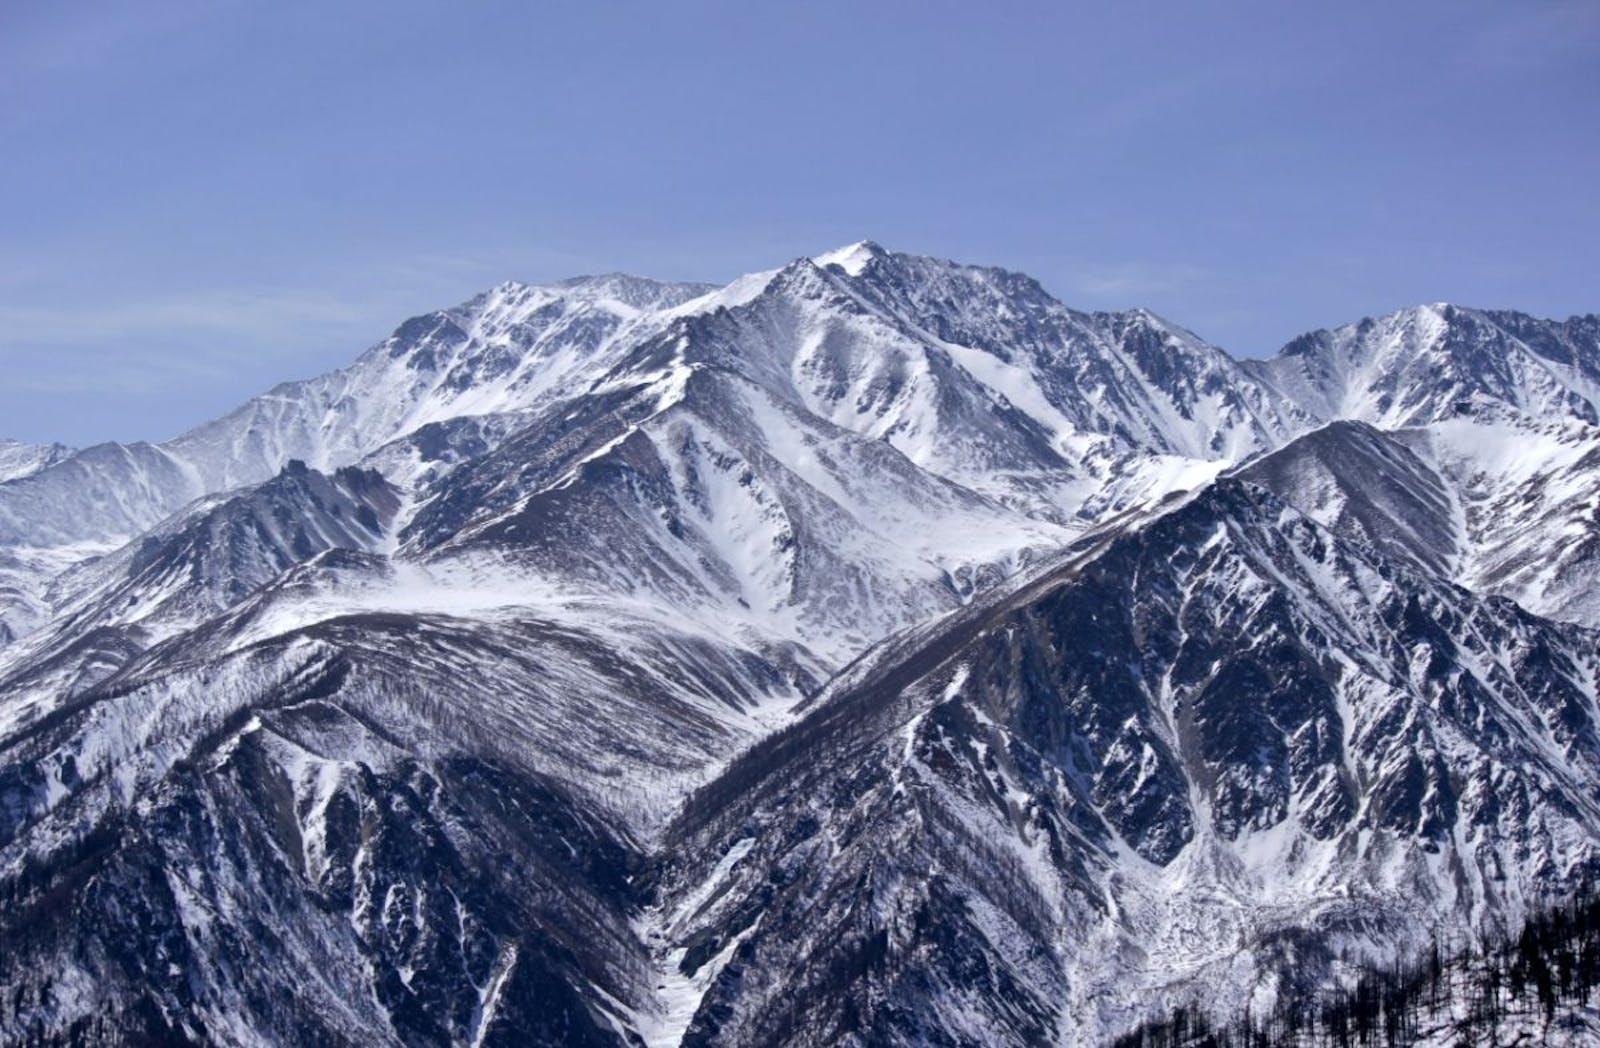 Sayan Alpine Meadows and Tundra